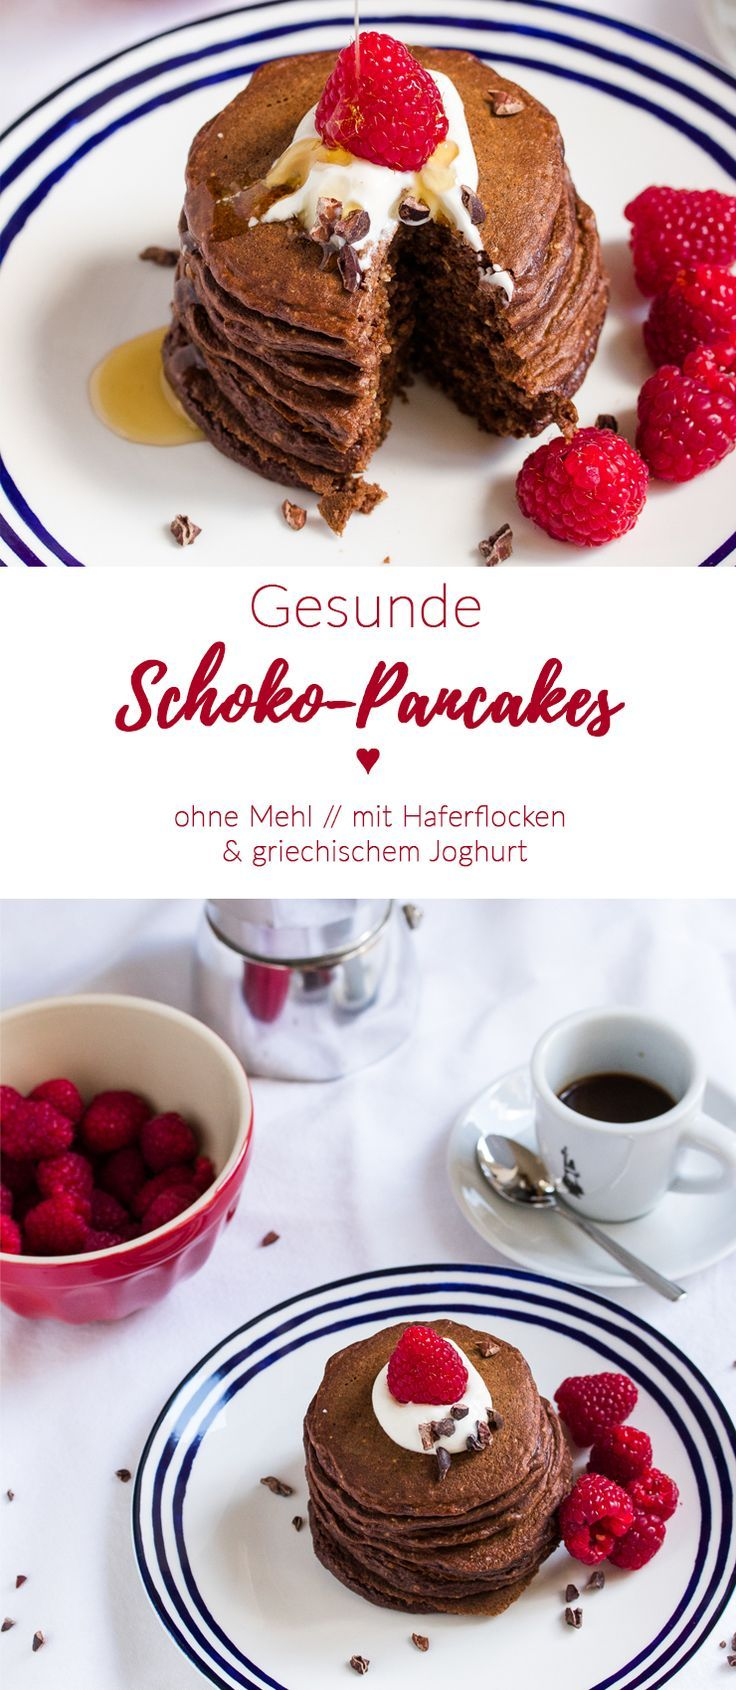 schoko pancakes ohne mehl mit haferflocken und joghurt low carb pancakes and food. Black Bedroom Furniture Sets. Home Design Ideas